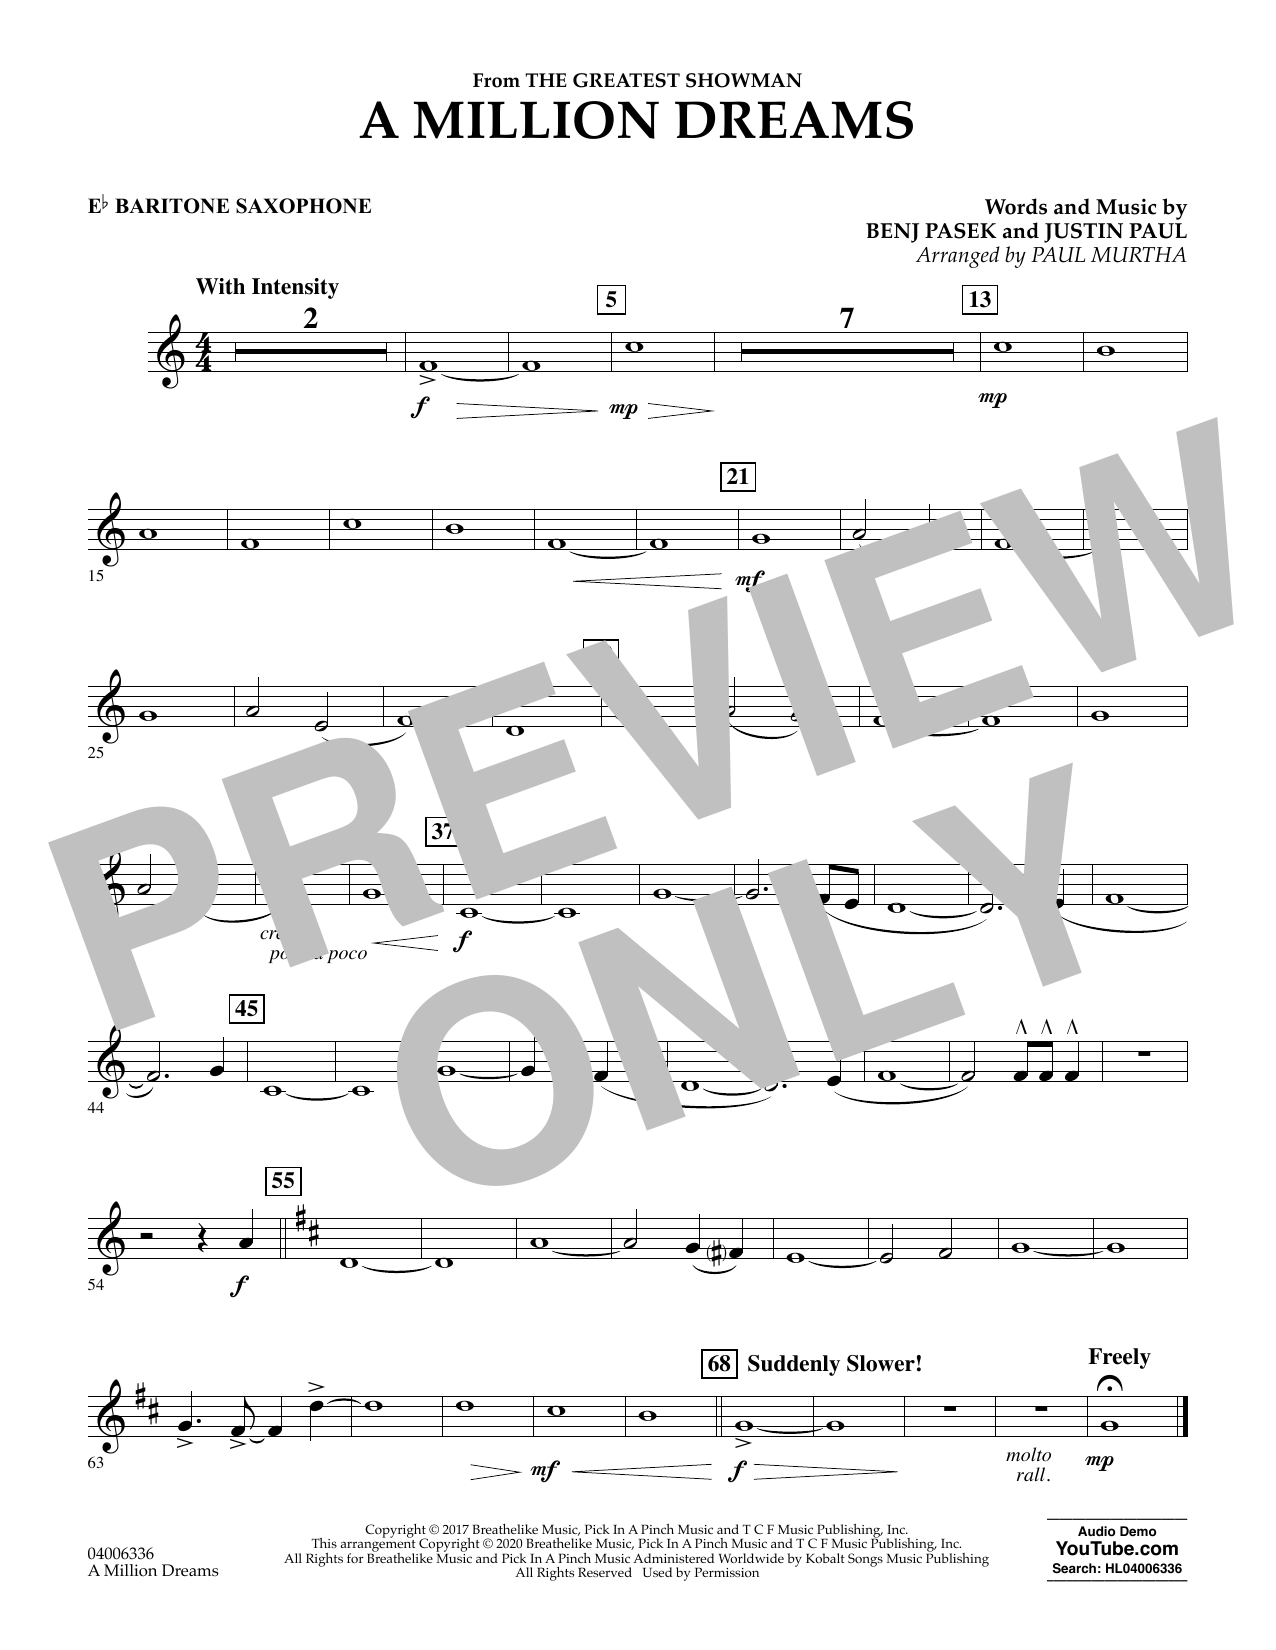 A Million Dreams (from The Greatest Showman) (arr. Paul Murtha) - Eb Baritone Saxophone (Concert Band)